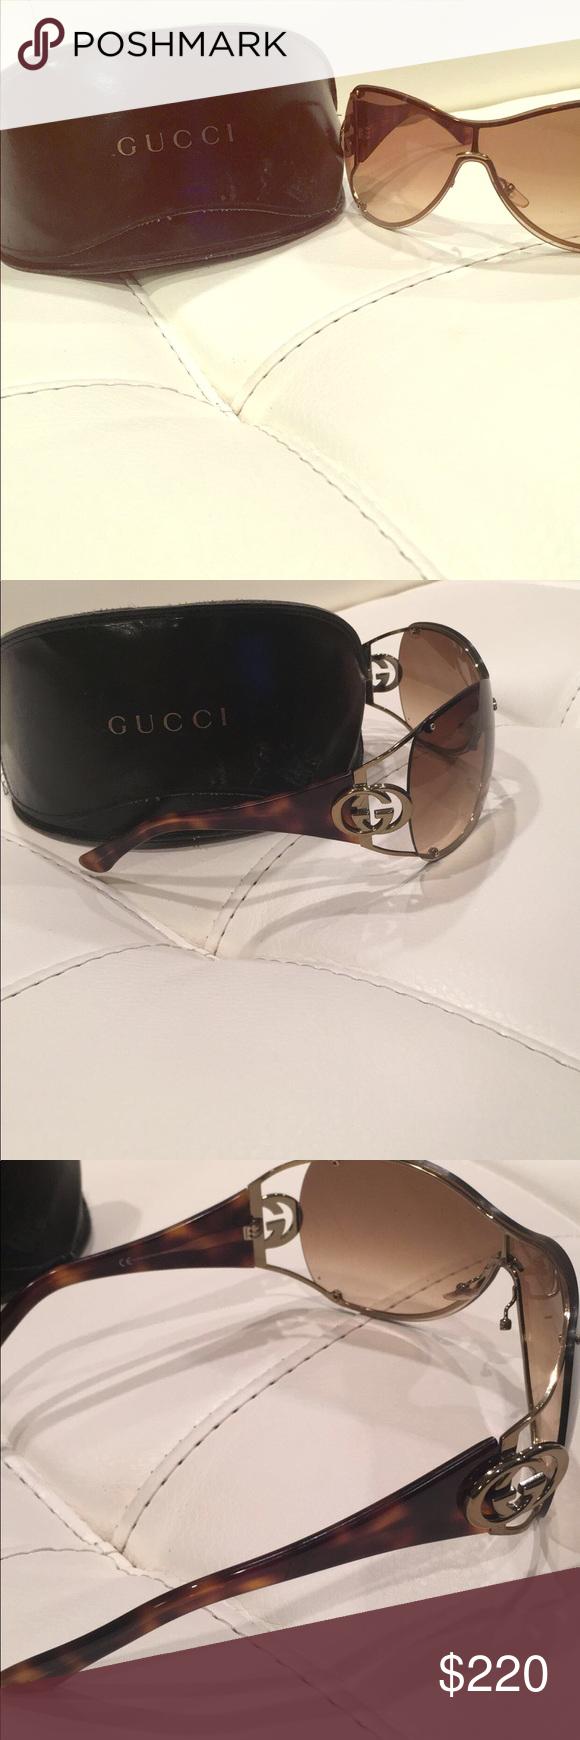 6b6cdb2b605 Gucci GG 2802 S Golden brown women sunglasses Pre-owned Gucci golden brown  gradient